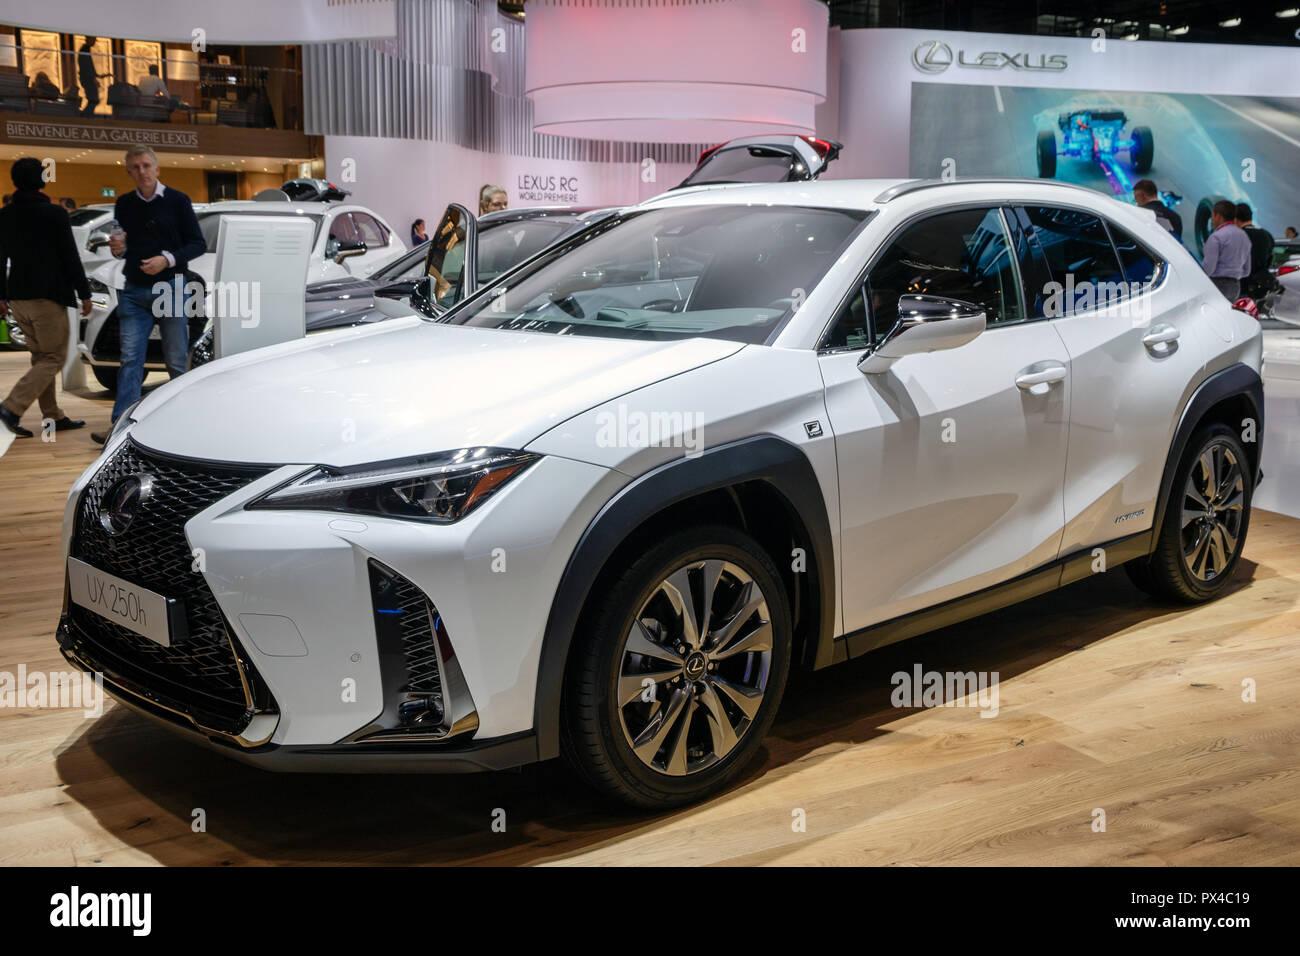 paris - oct 2, 2018: new 2019 lexus ux 250h hybrid crossover suv car